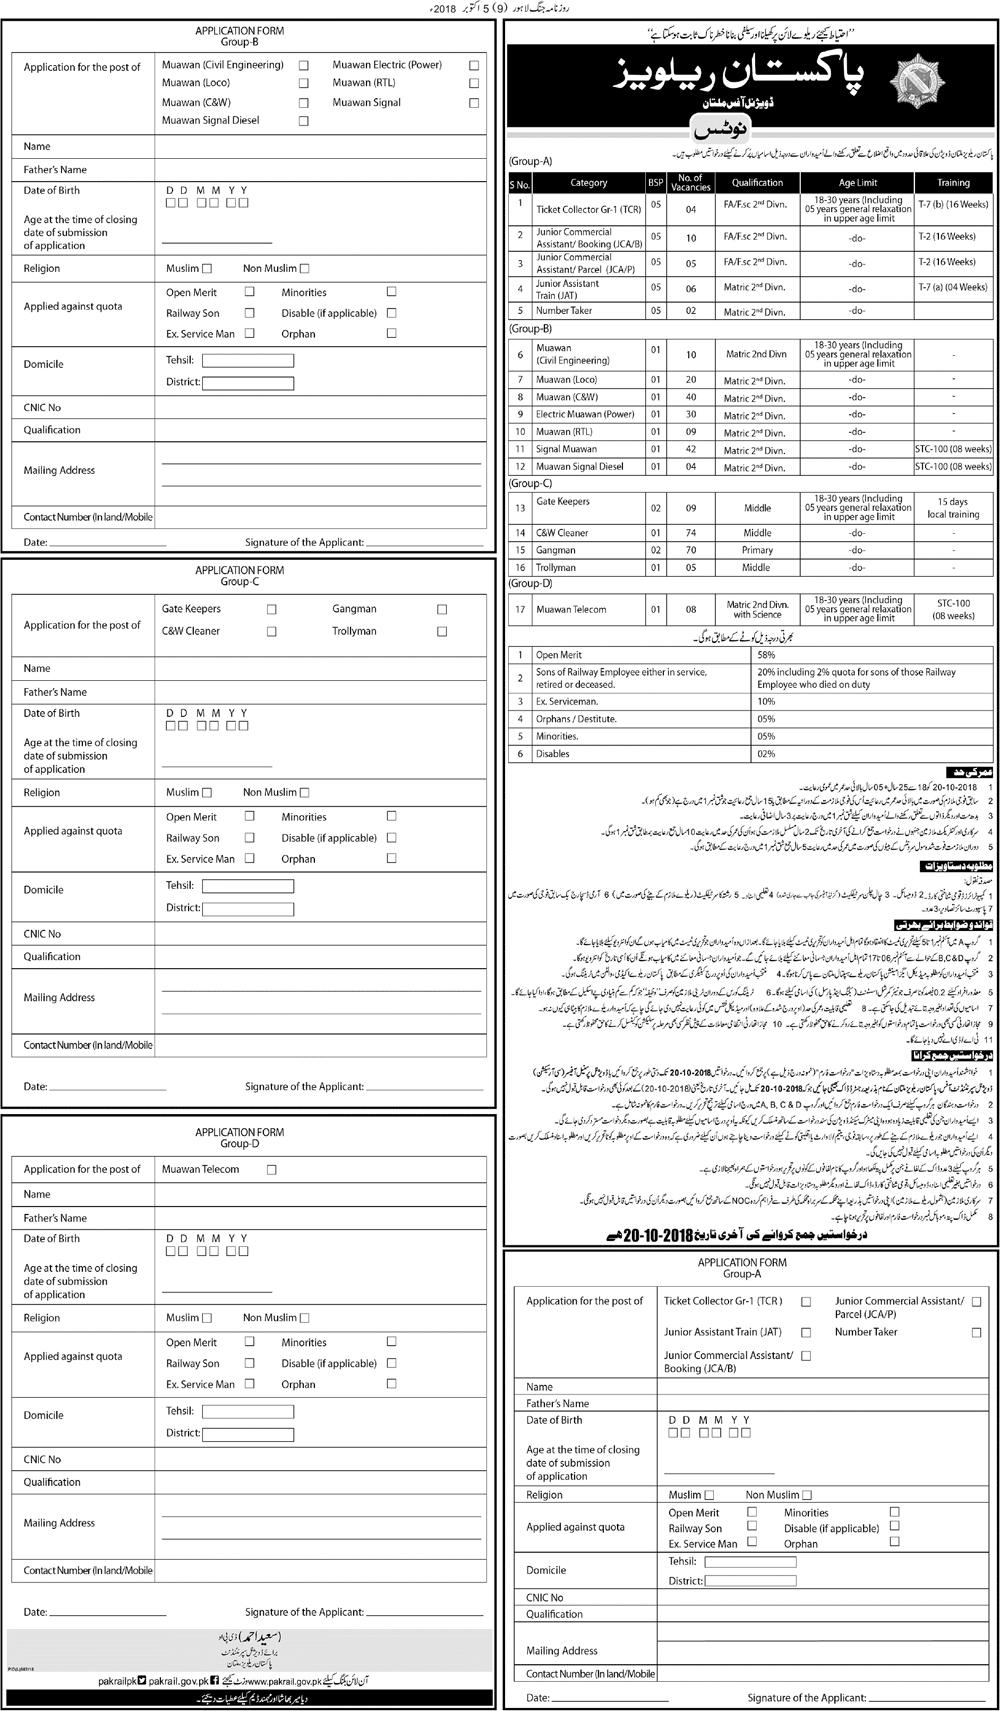 Pakistan Railway Divisional Office Multan Latest Jobs 2018 Government Jobs-thumbnail